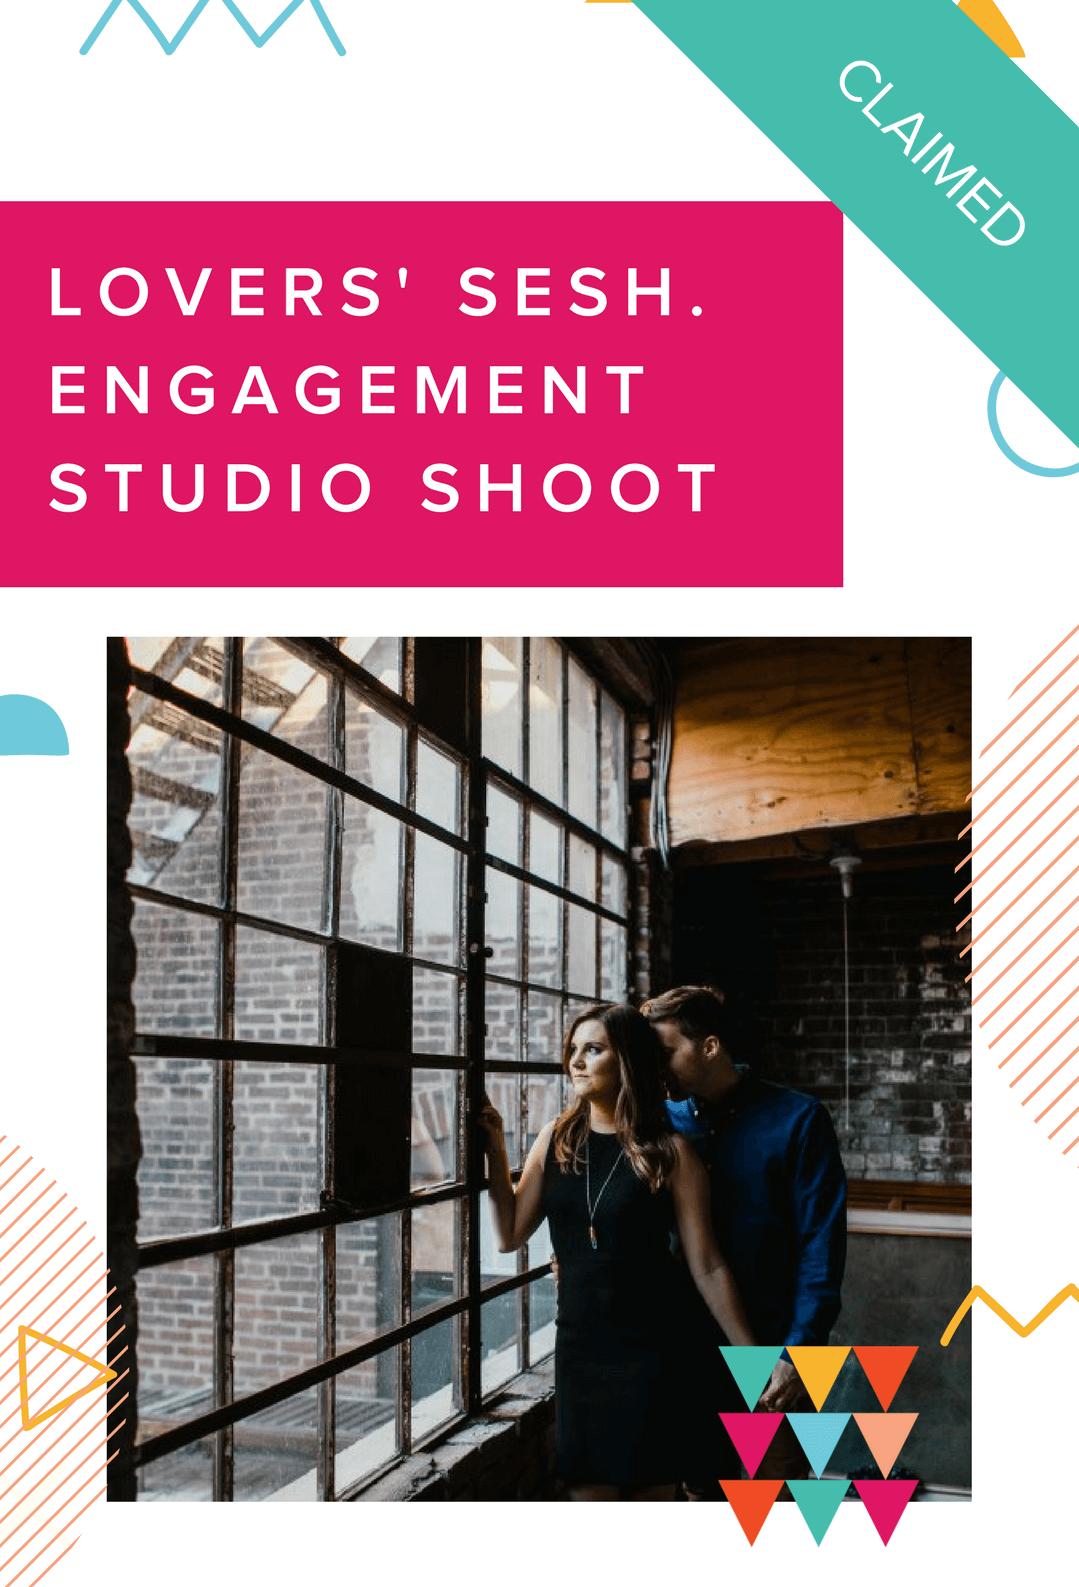 Prize - Love Me Do Lovers' sesh engagement studio shoot - claimed